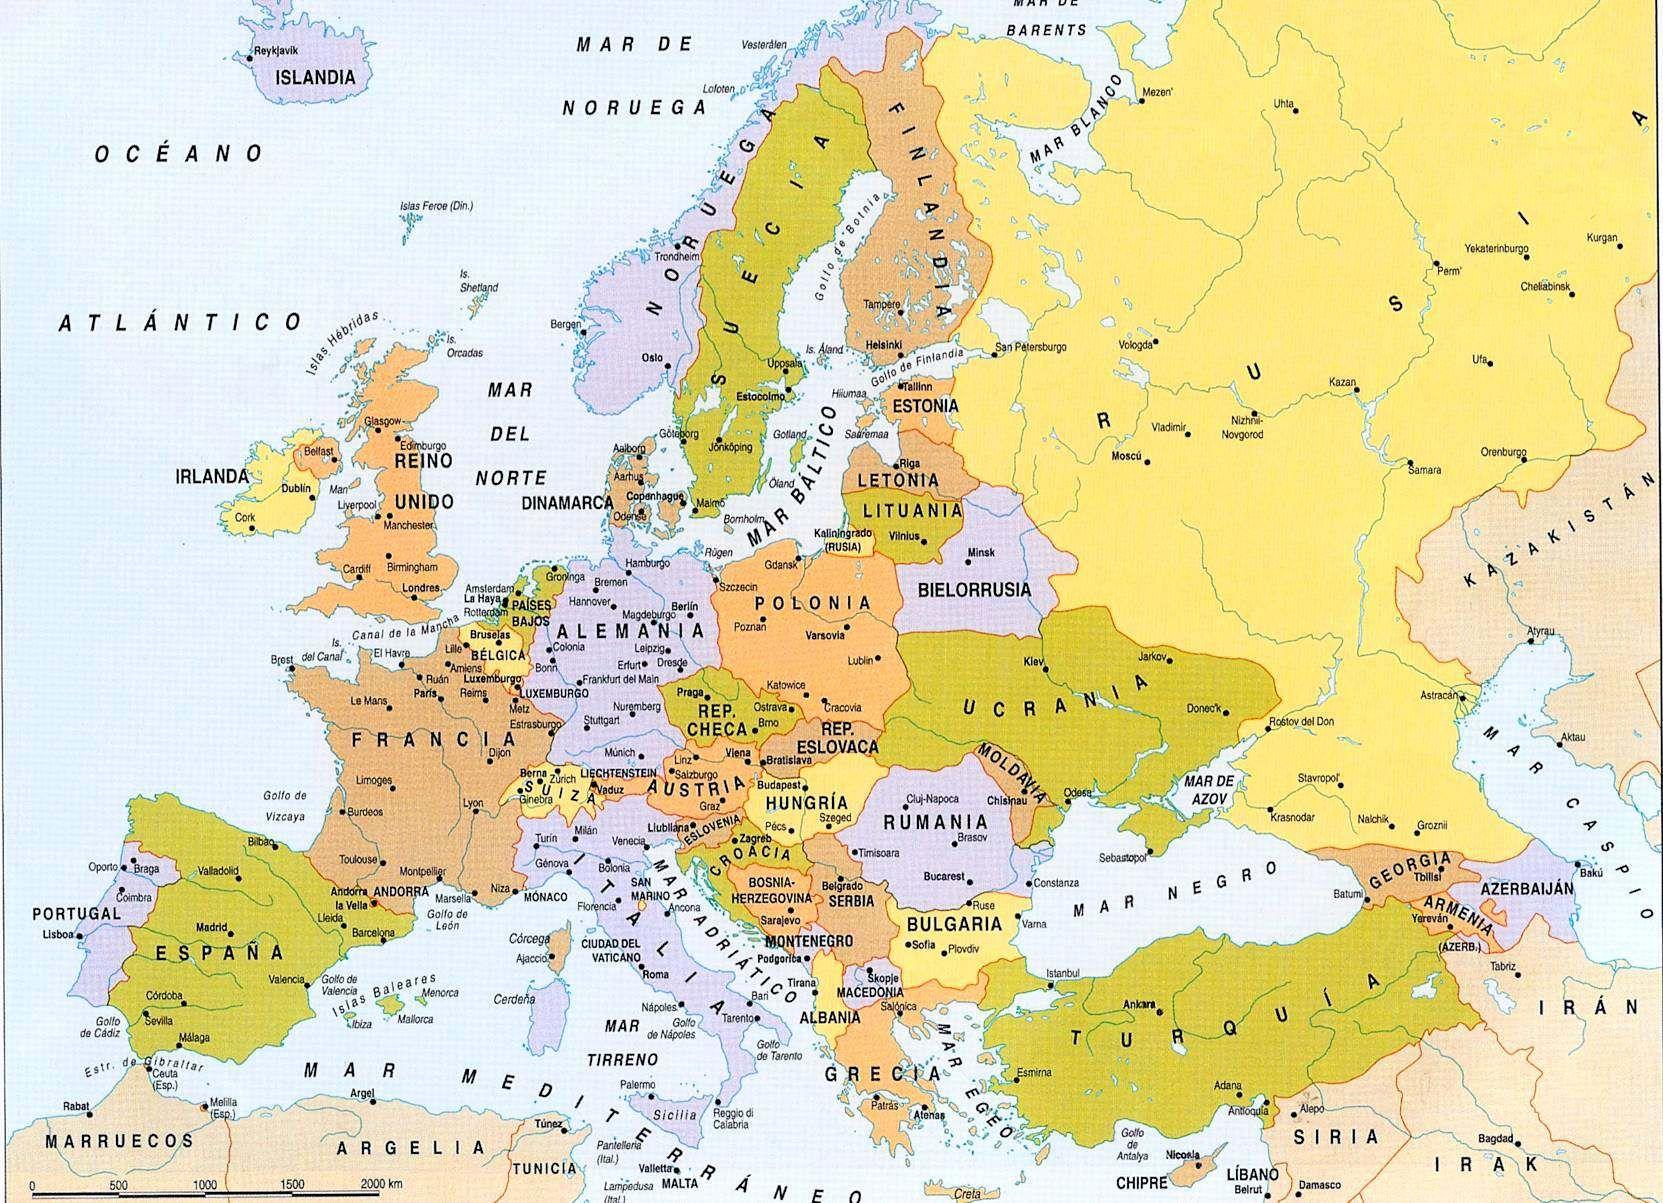 Mapa Politico De Europa Grande Con Breve Descripcion Geografica